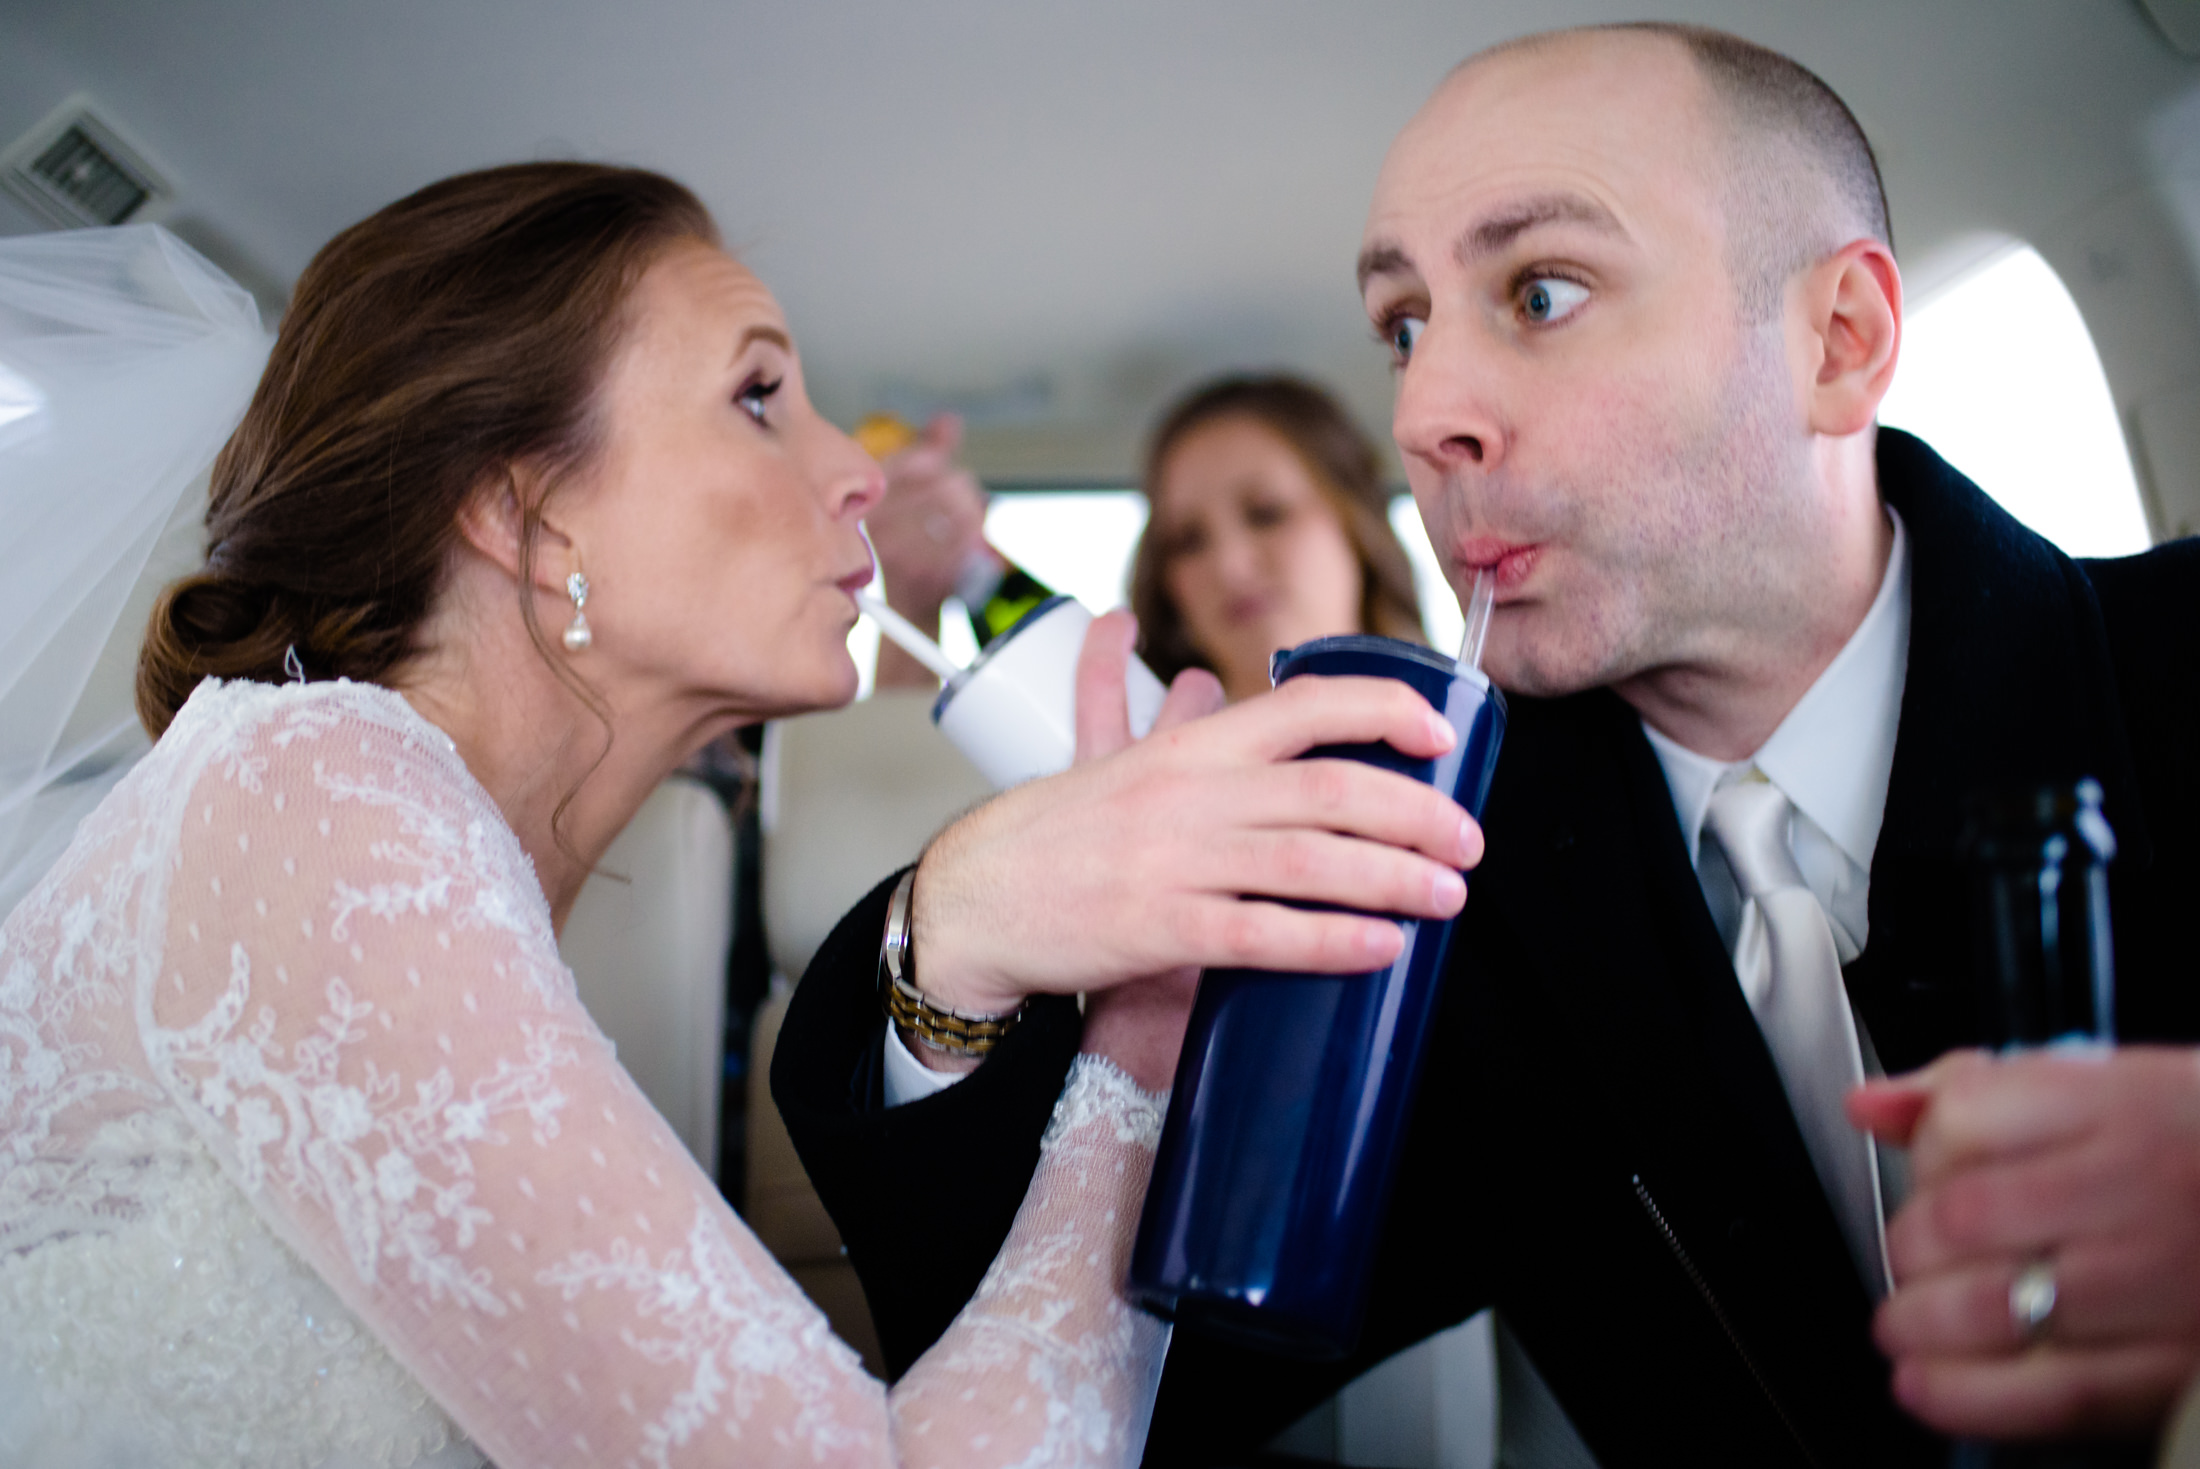 st-johns-creighton-omaha-wedding-photographer-jm-studios-0017.JPG